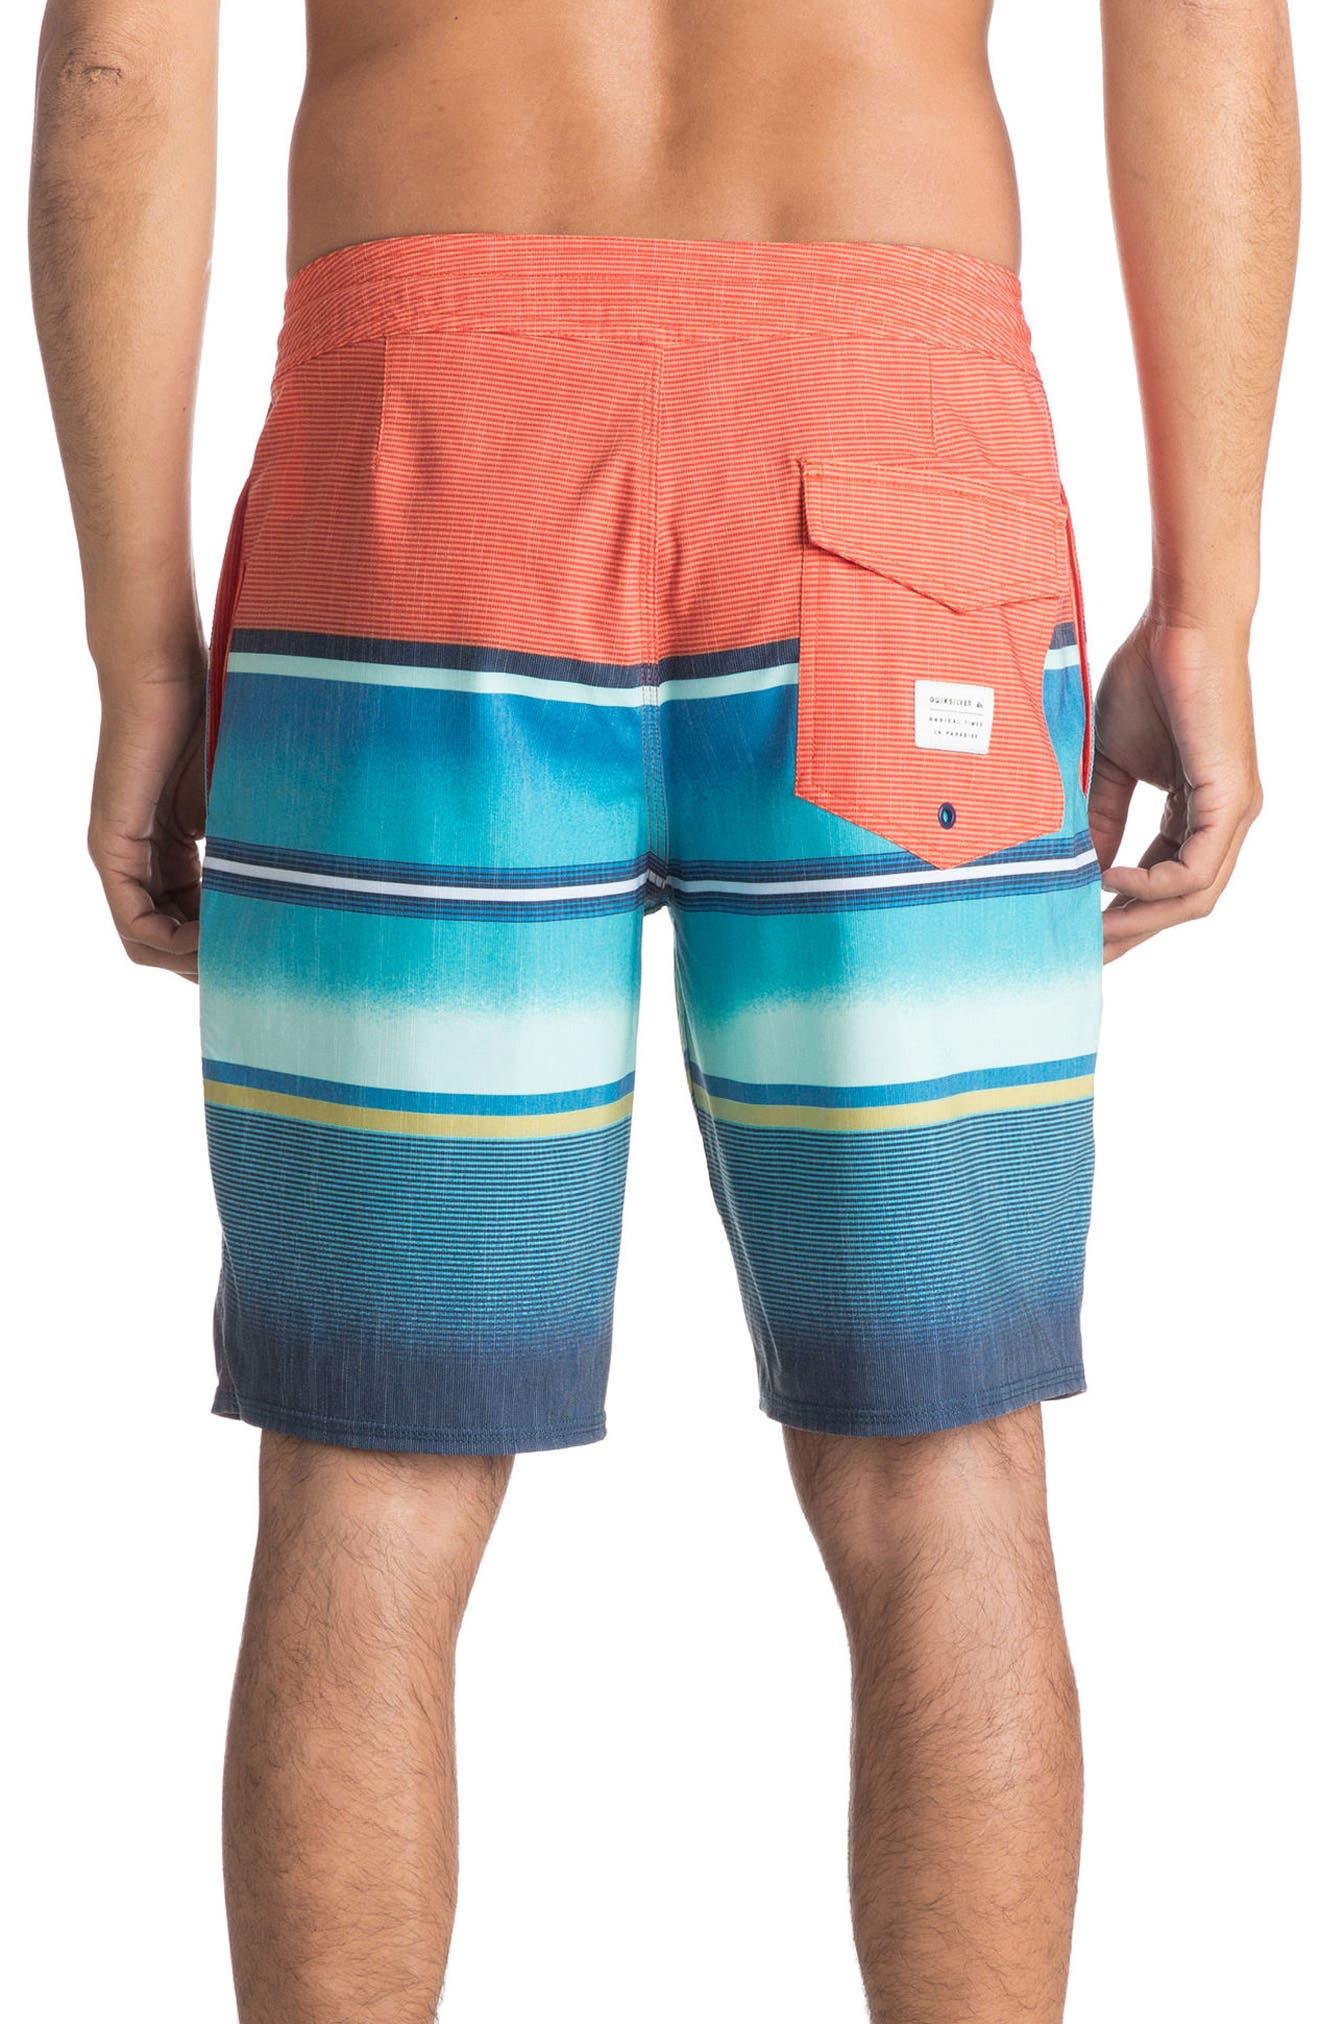 Swell Vision Board Shorts,                             Alternate thumbnail 2, color,                             650